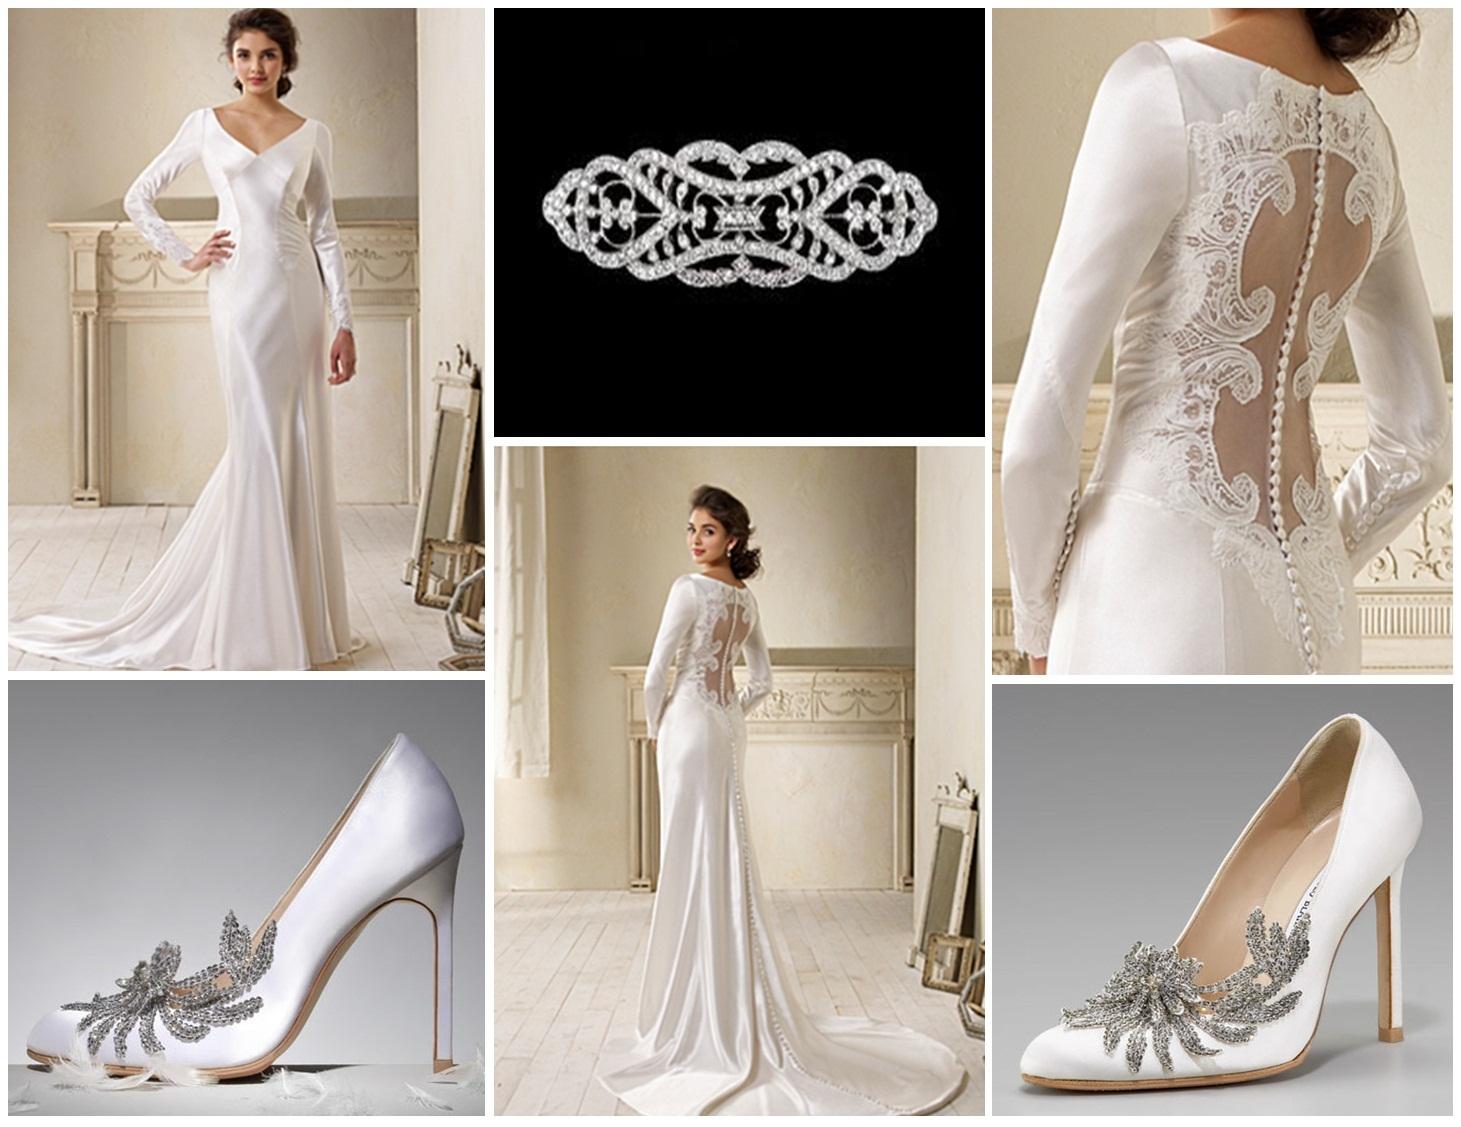 mms & nfs: Bella Swan wedding dress inspired